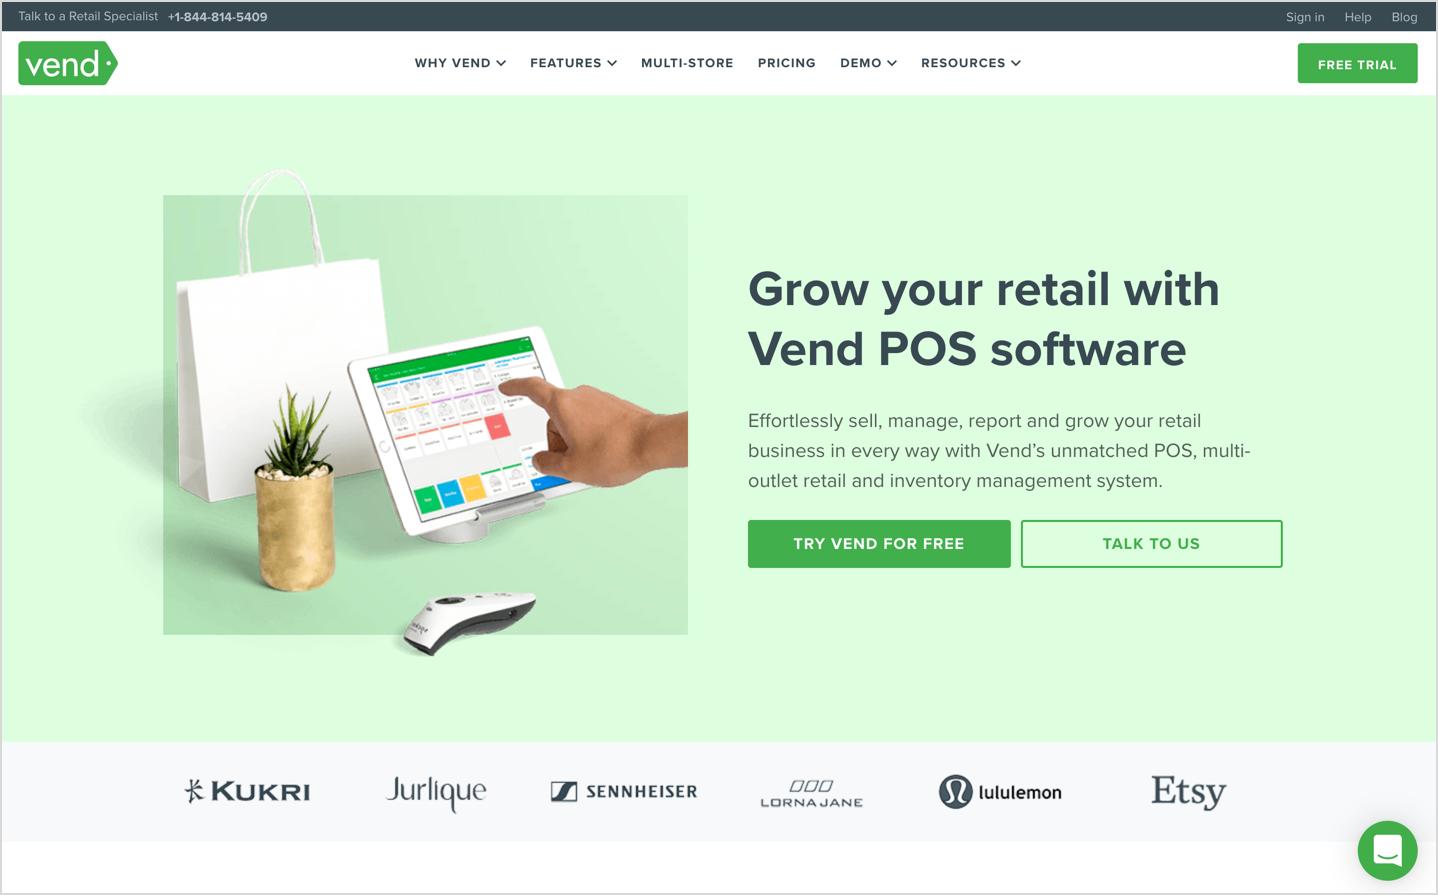 vend homepage